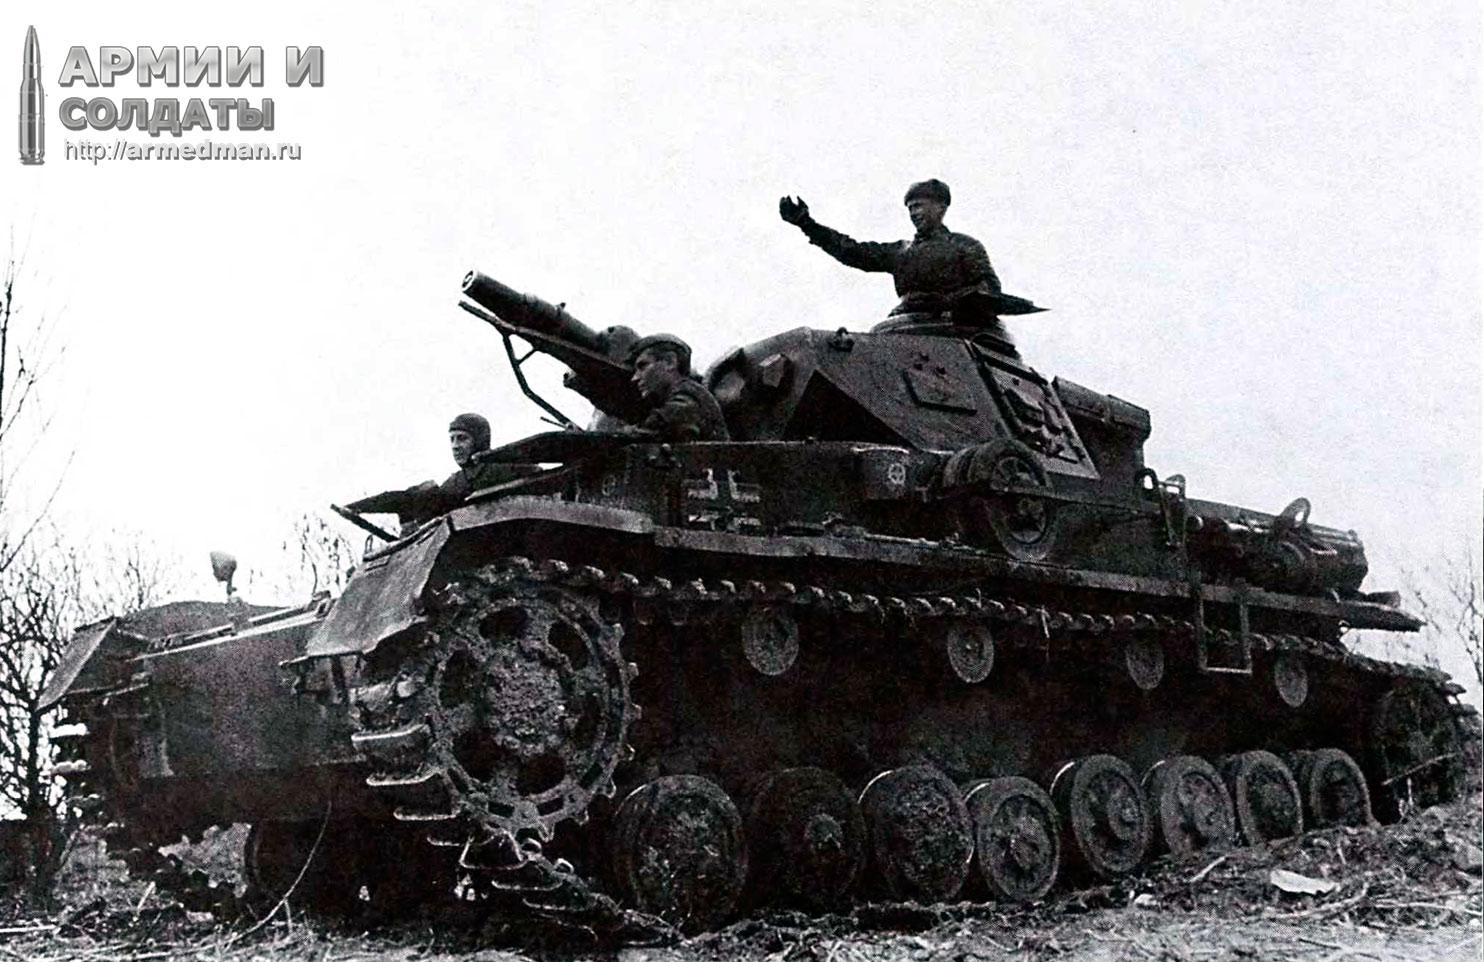 Pz-IV-Aust-F1-на-службе-в-Красной-Армии,-1943